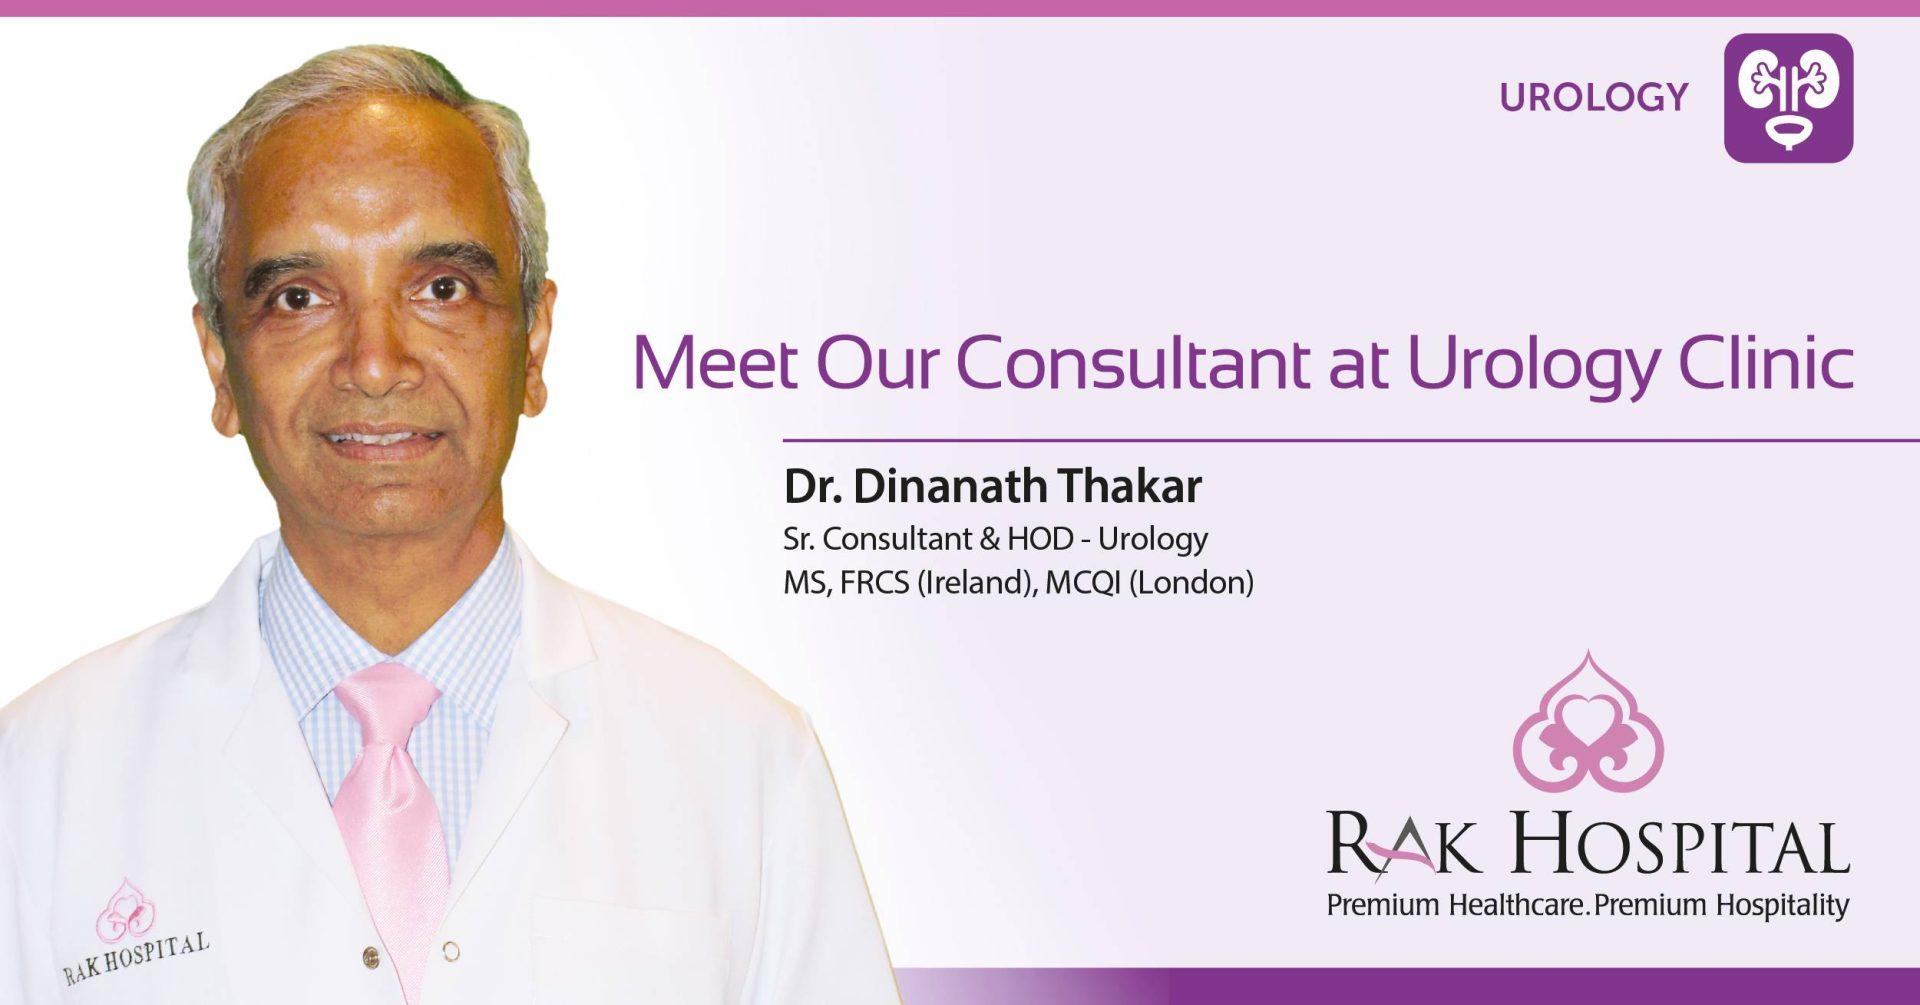 Meet Our Consultant at Urology Clinic Dr. Dinanath Thakar – RAK Hospital    The Best Hospital in UAE, Northern Emirates, Dubai